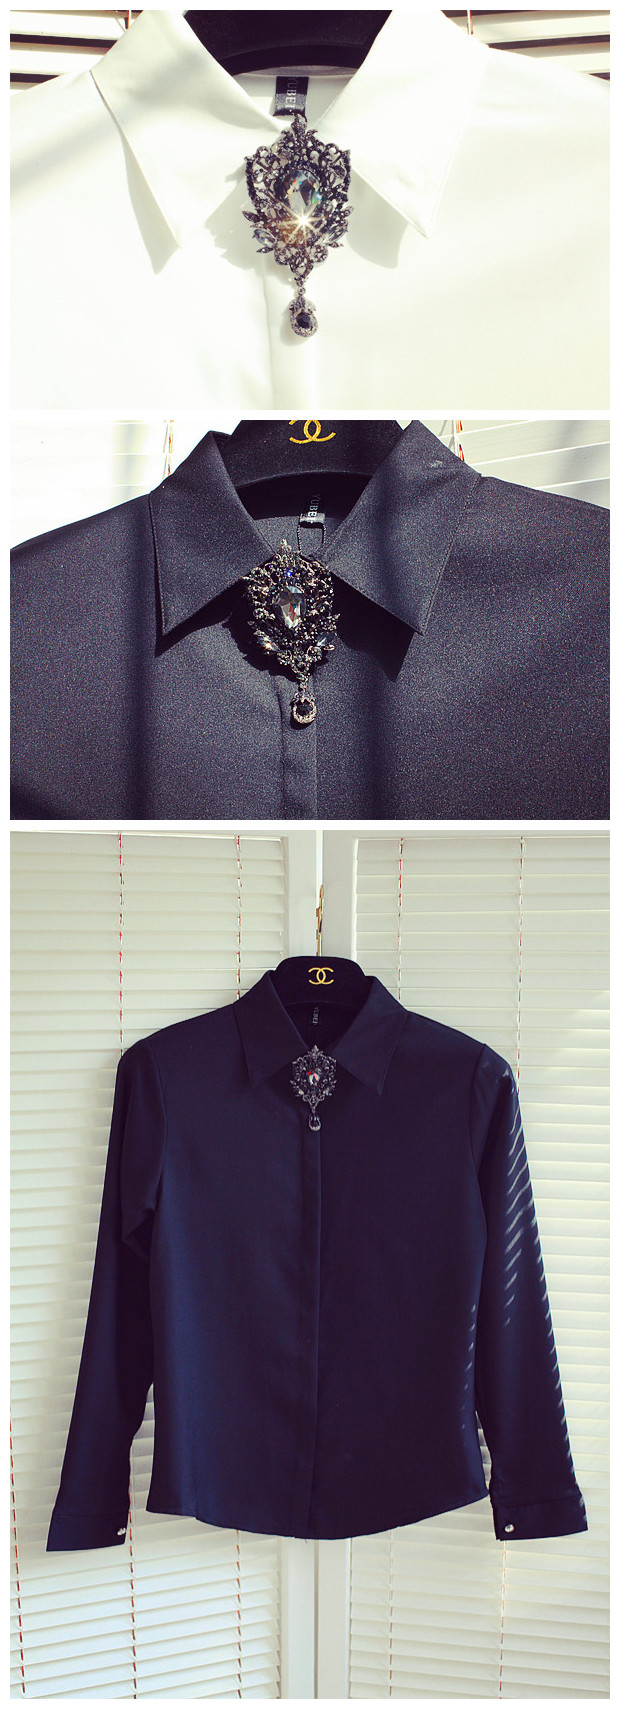 2017 New Arrival Special Offer Cotton Women Blouses Body Woman Shirt Retro Diamond Rhinestone Gemstone Collar Sleeve Female